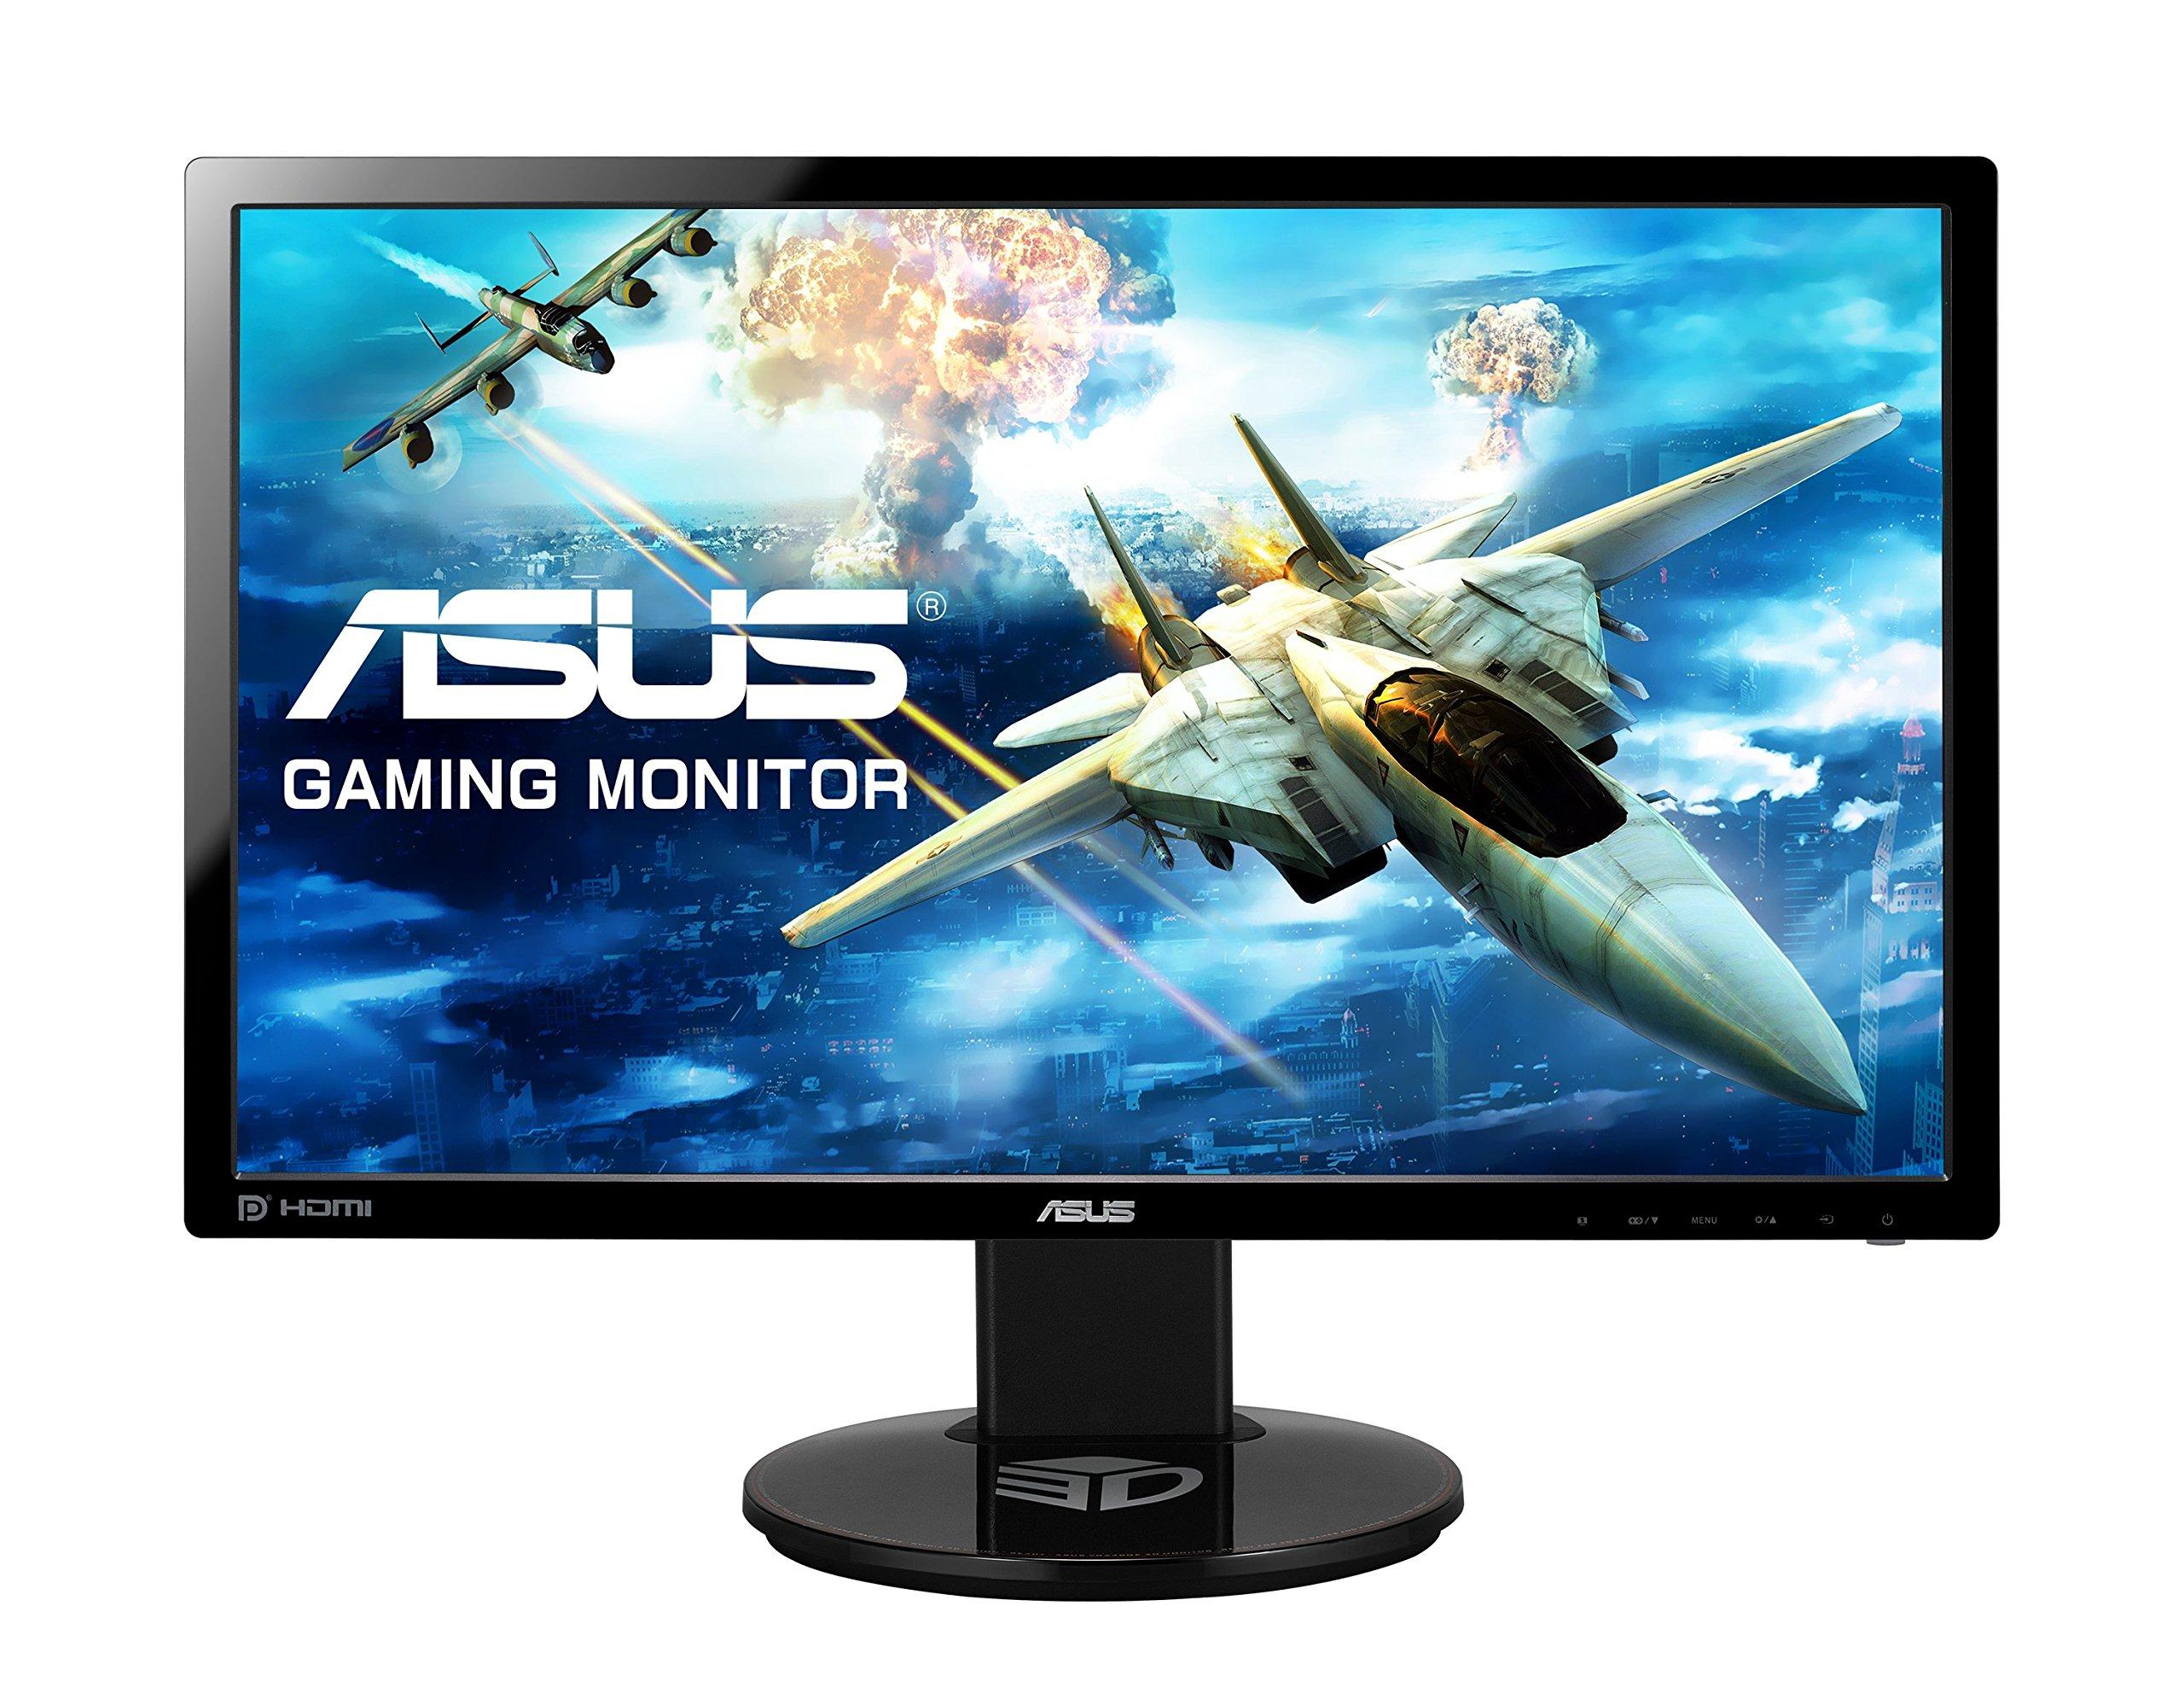 "Asus VG248QE Ecran PC 24.0""(61.0cm) 16:9, 1920x1080, HDMI, DisplayPort, Dual-link DVI-D ( NVIDIA 3D Vision), Noir product image"